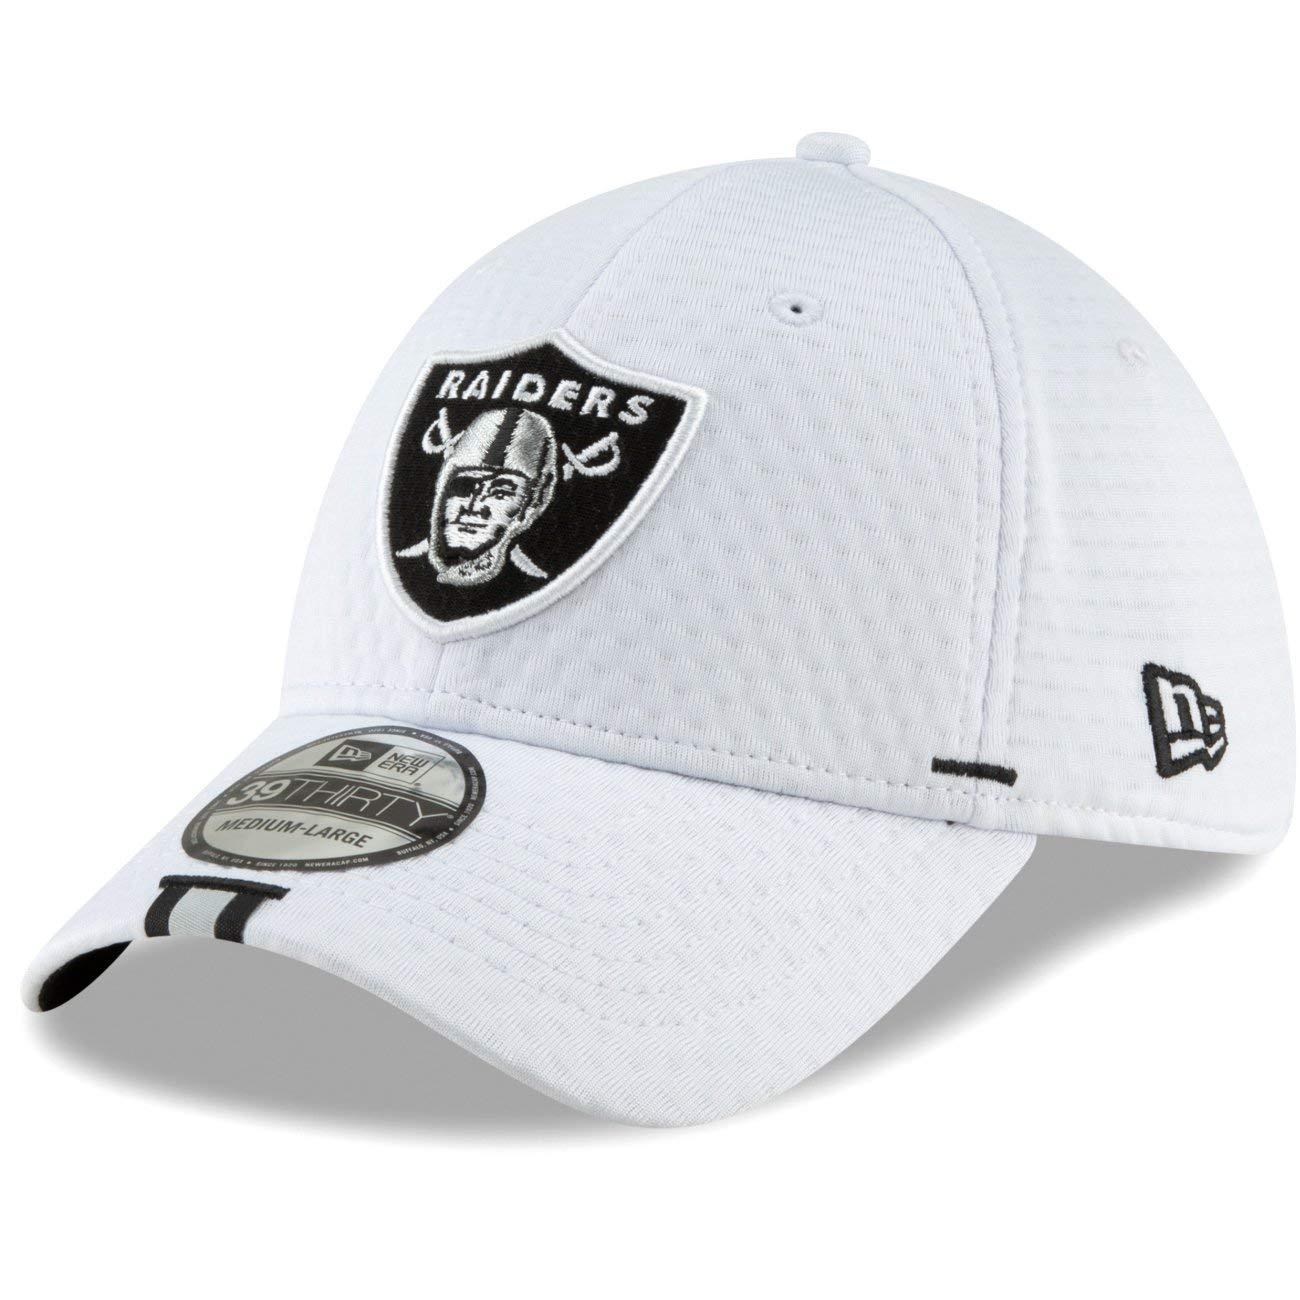 766046b8f76e77 M-L Era Cap - NFL Training Camp Oakland Raiders New 39Thirty ...